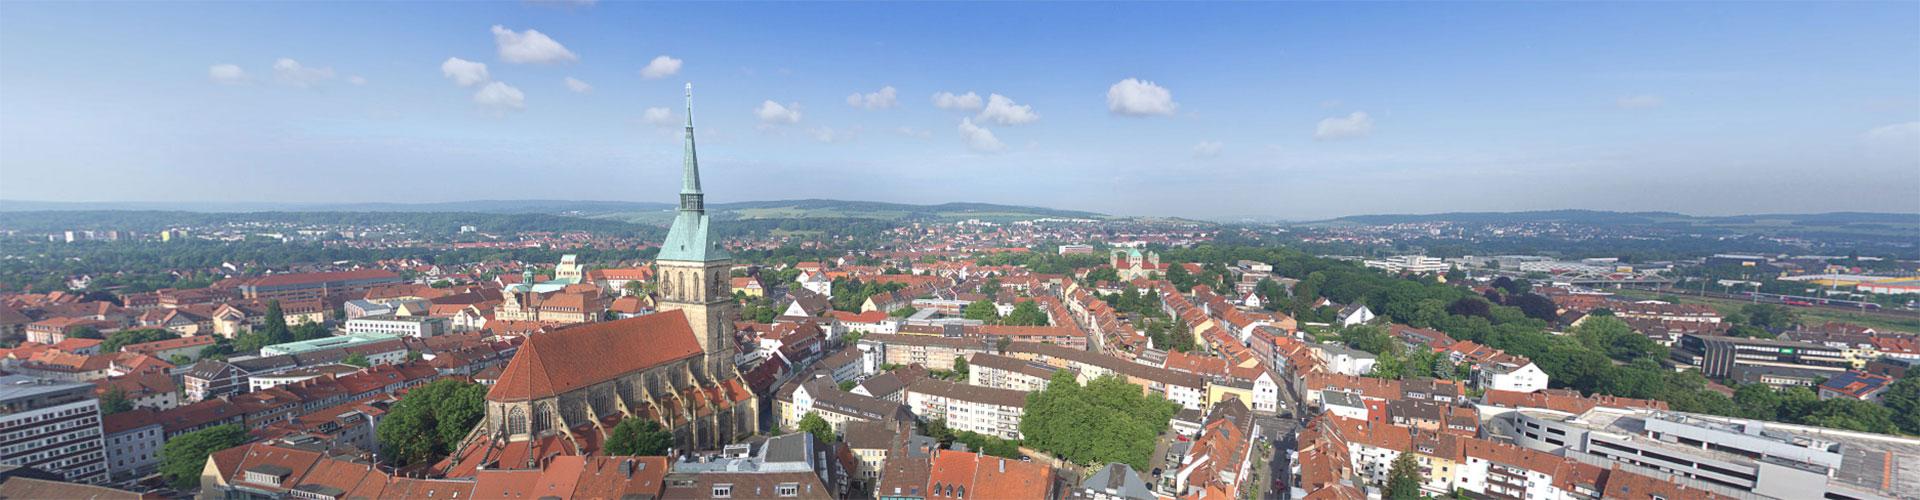 Panorama über Hildesheim